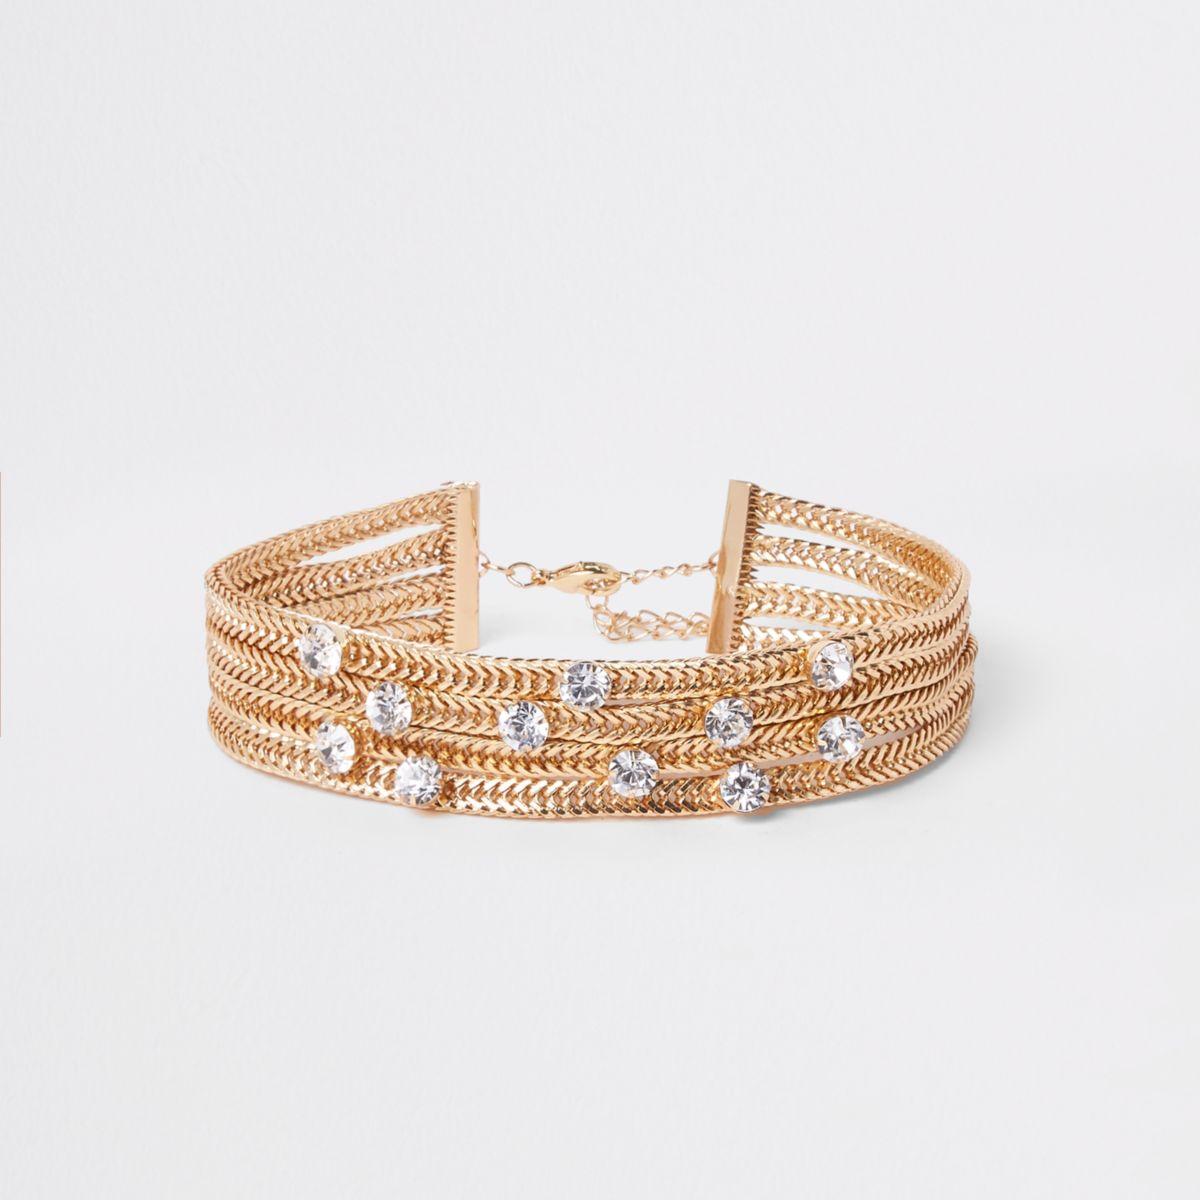 Gold tone chunky layered snake chain choker